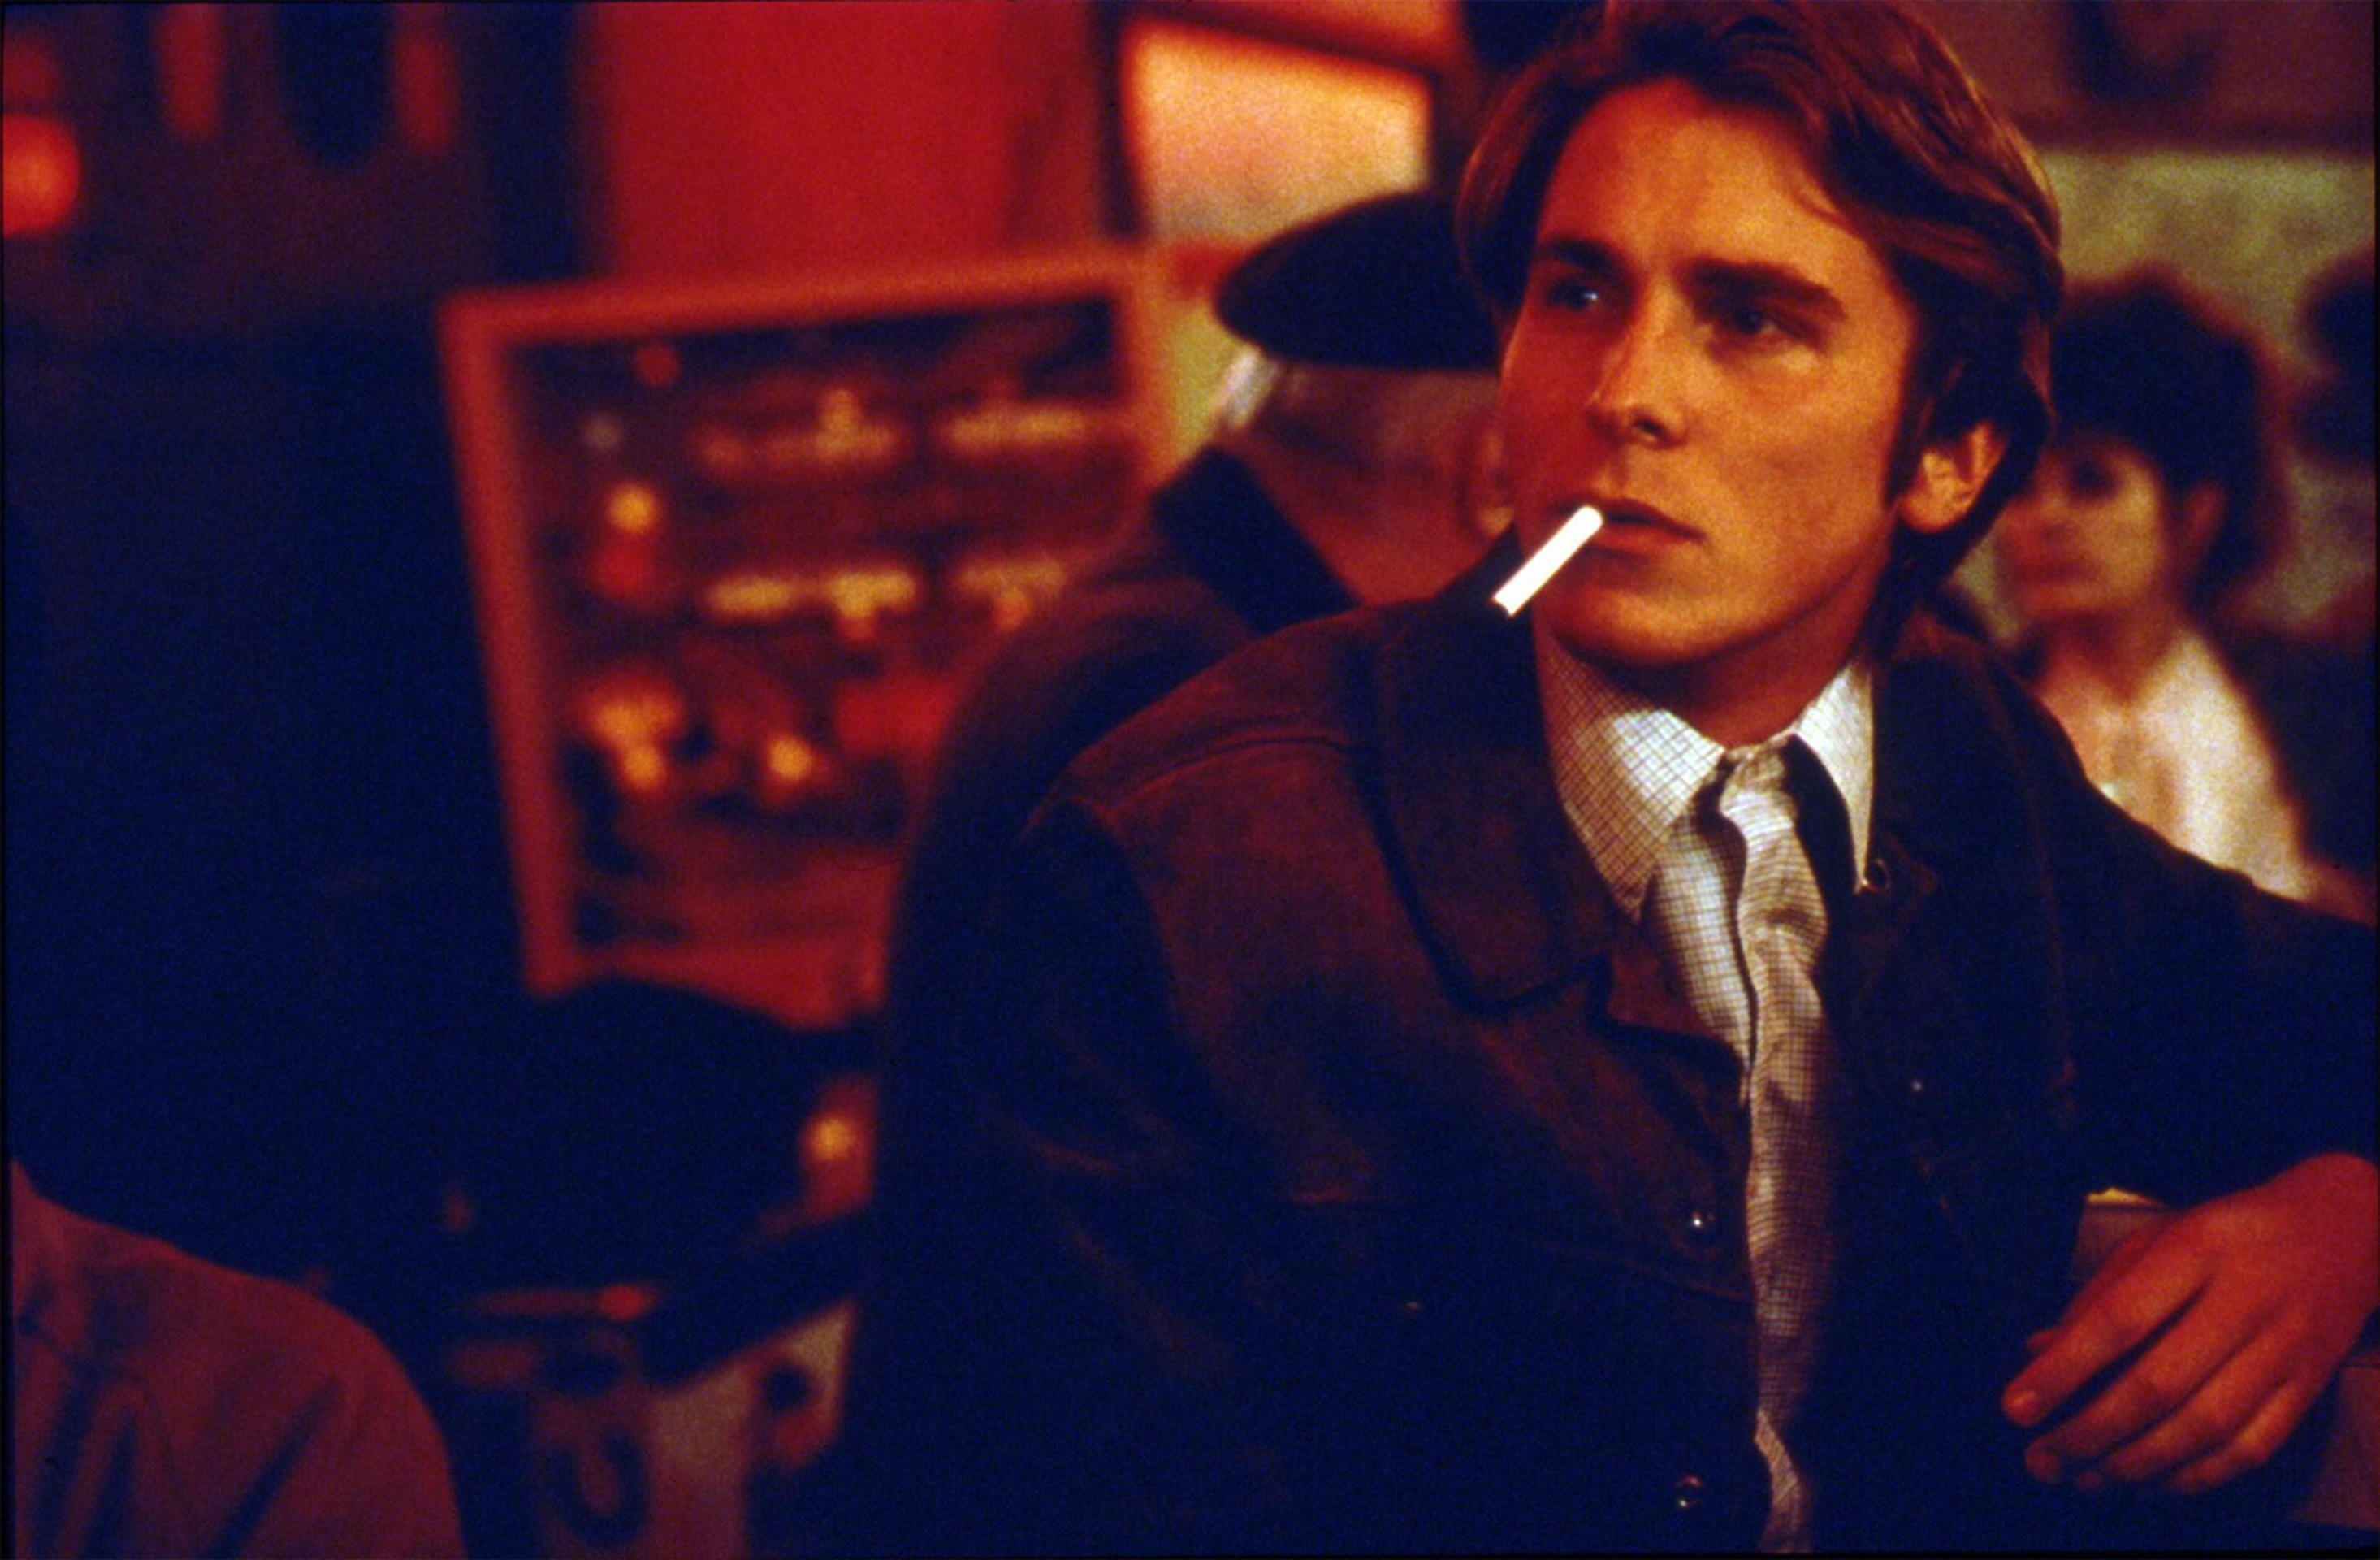 Metroland Movie Still 1997 Christian Bale As Chris Lloyd Christian Bale Batman Christian Bale Tv Actors